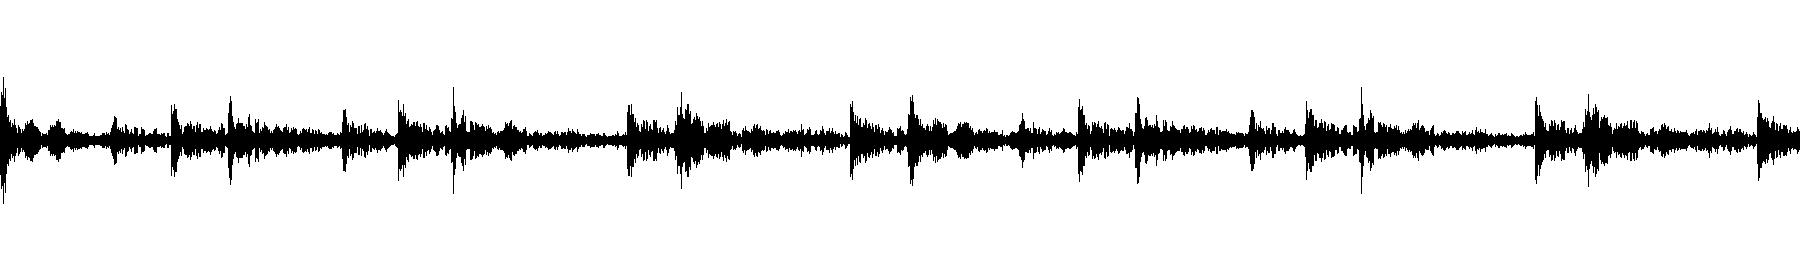 blbc cinedrumsb 110 02